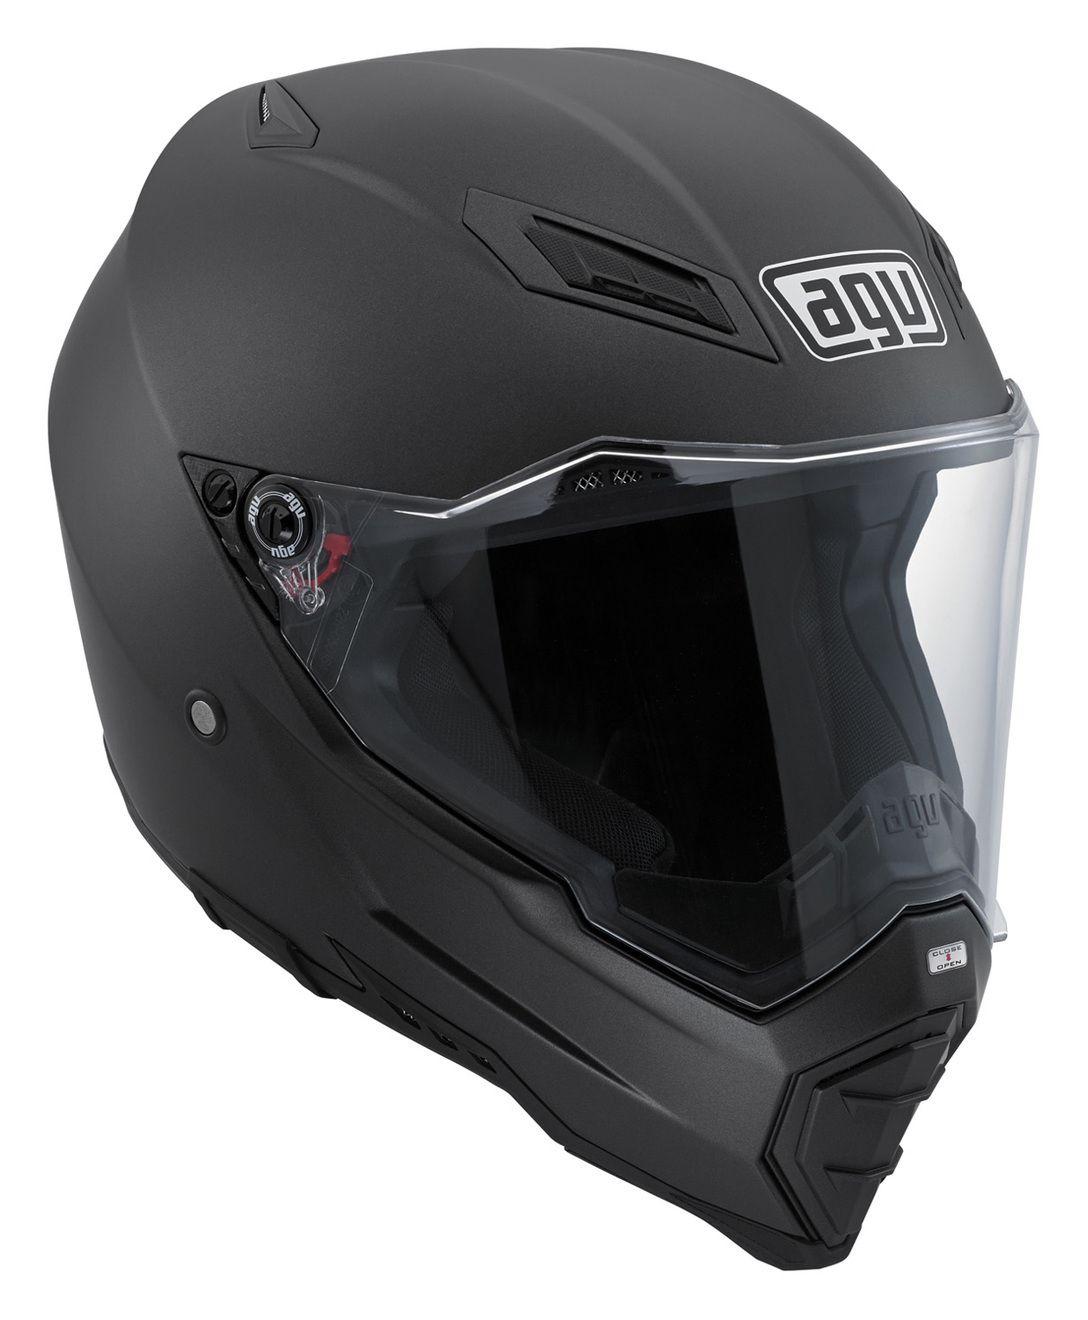 AGV AX-8 EVO Naked Helmet | 34% ($129.96) Off! - RevZilla